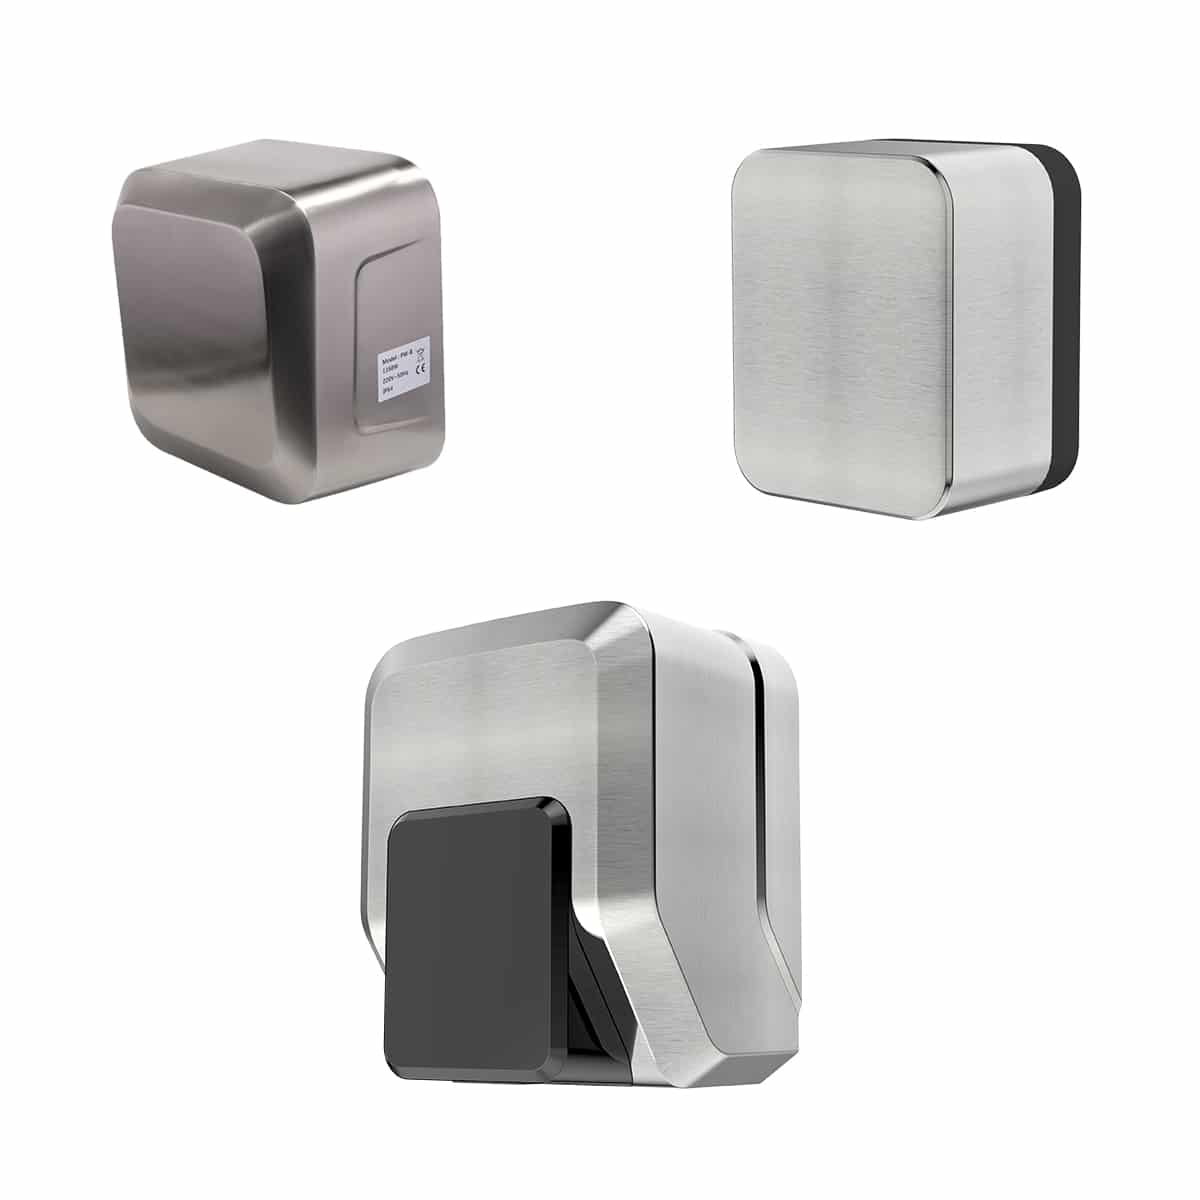 Single-Side Jet Hand Dryer